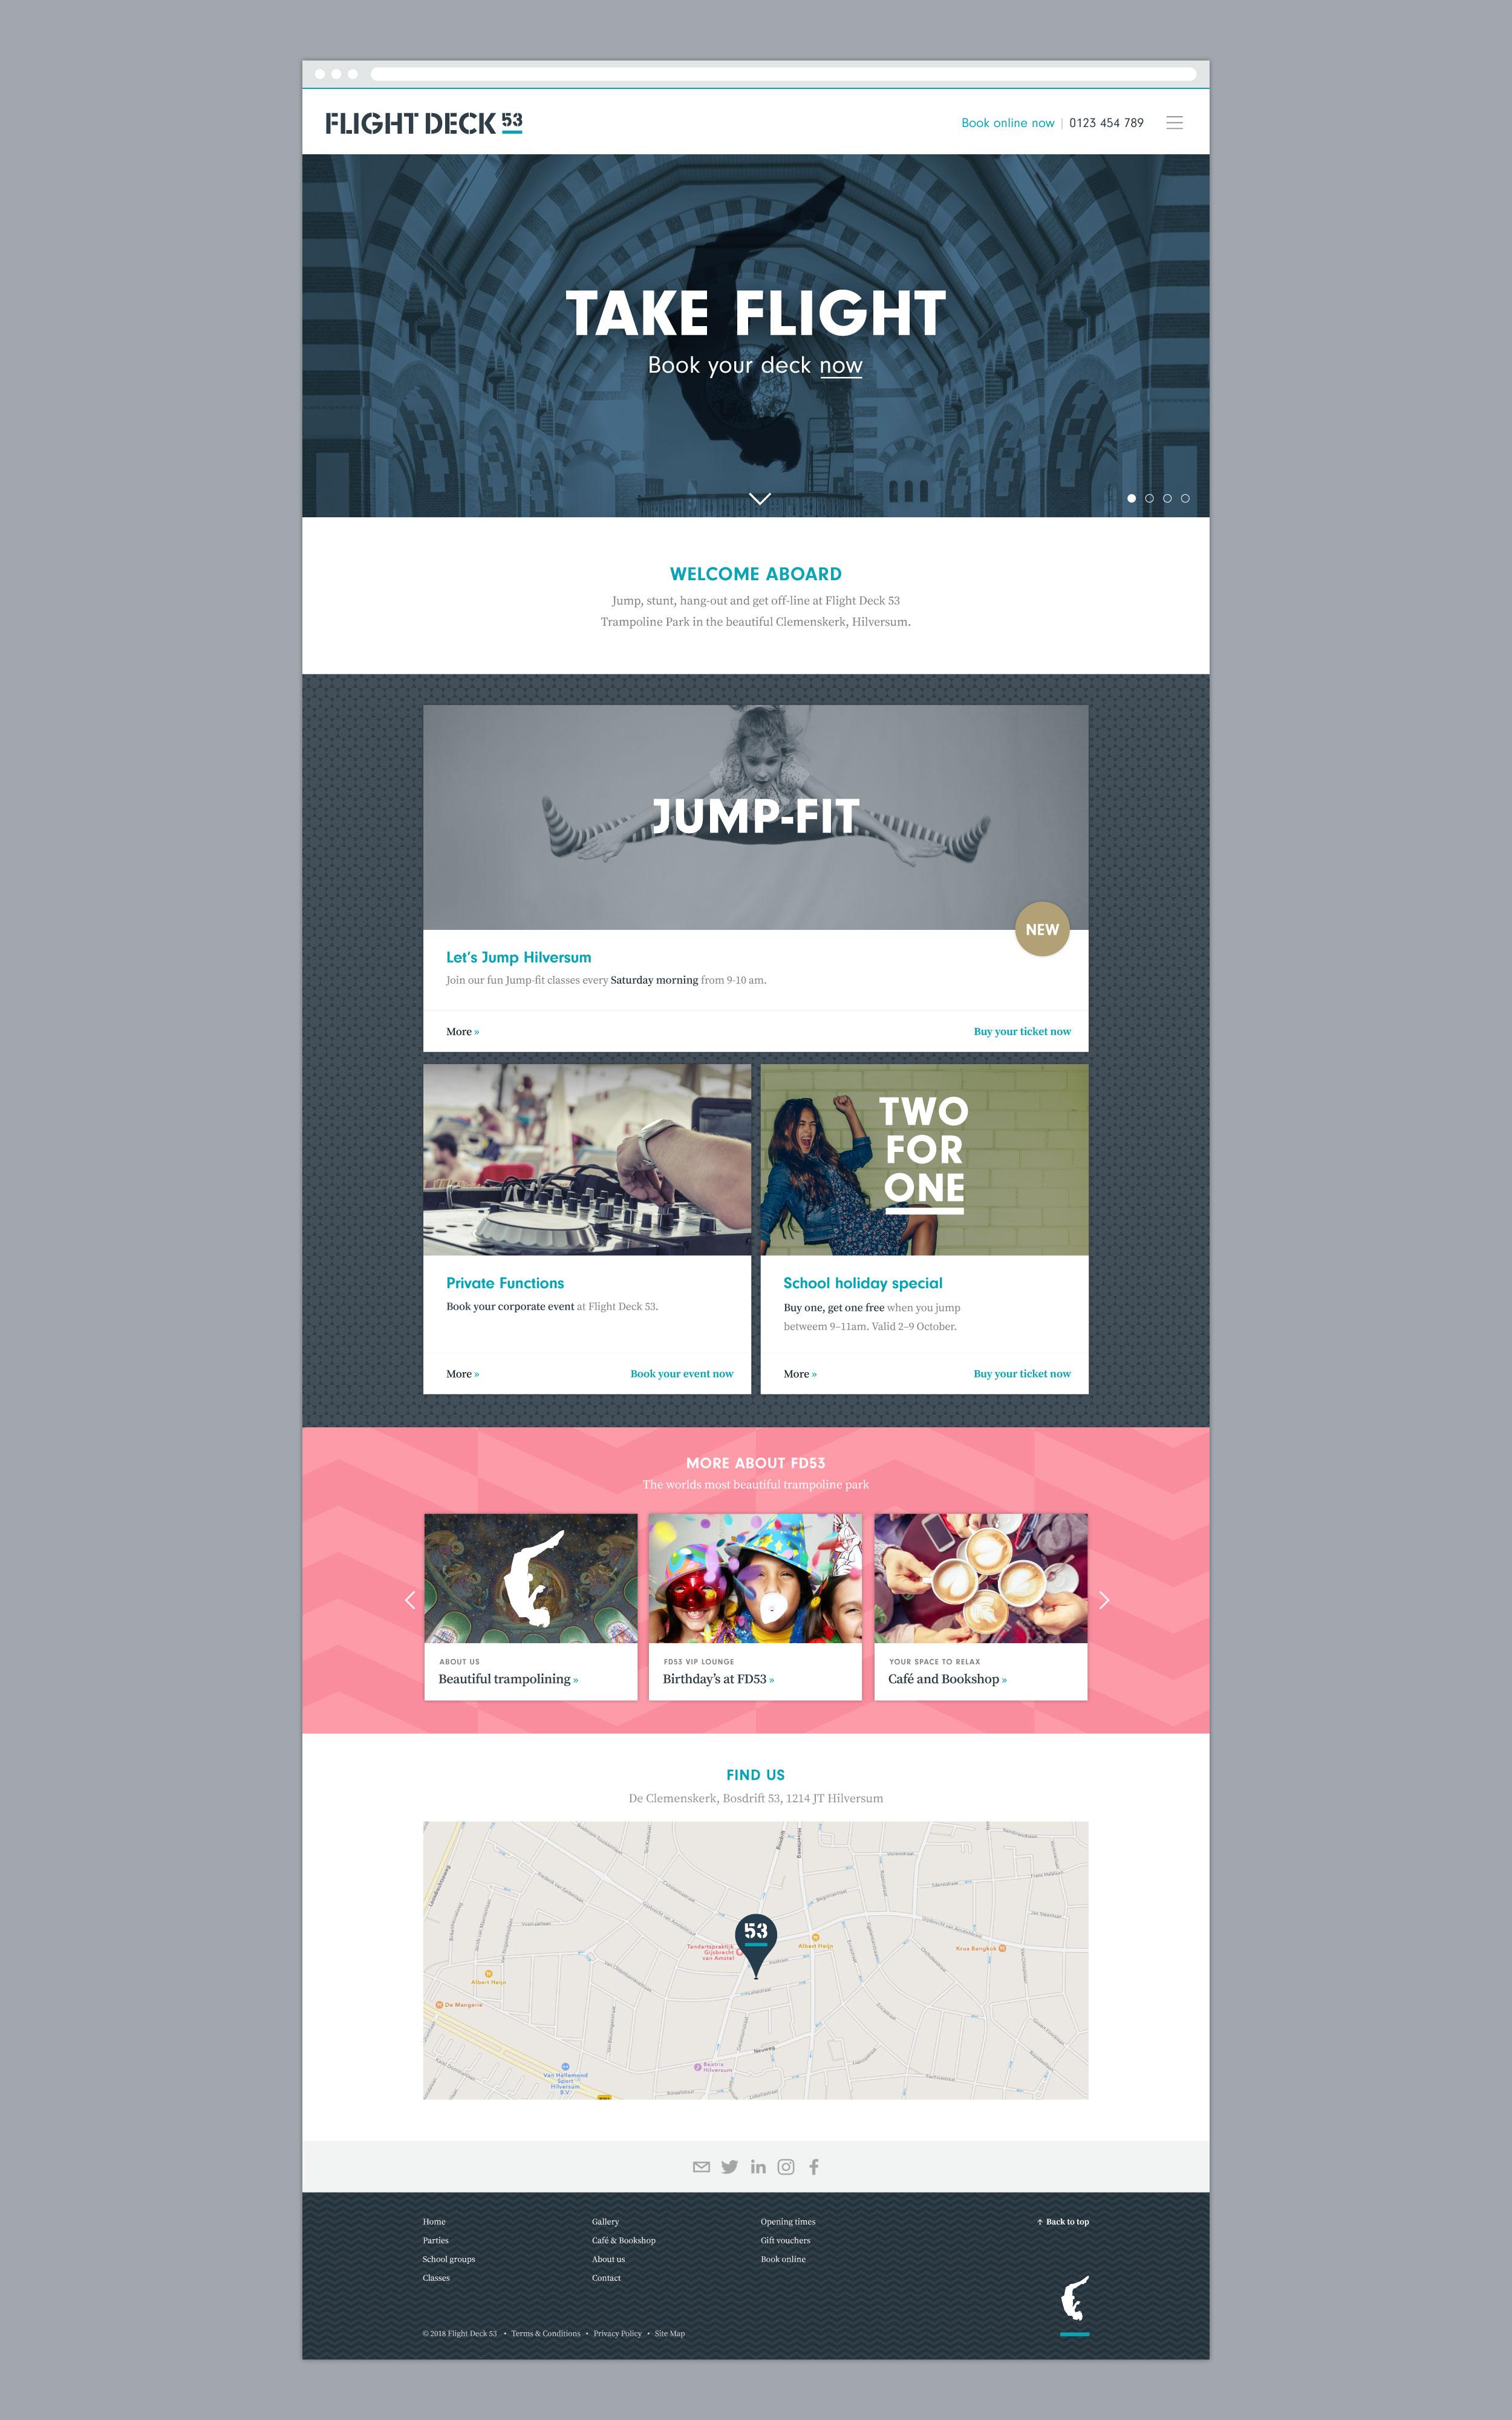 Flight Deck 53 website design concept – Design by Ian Whalley